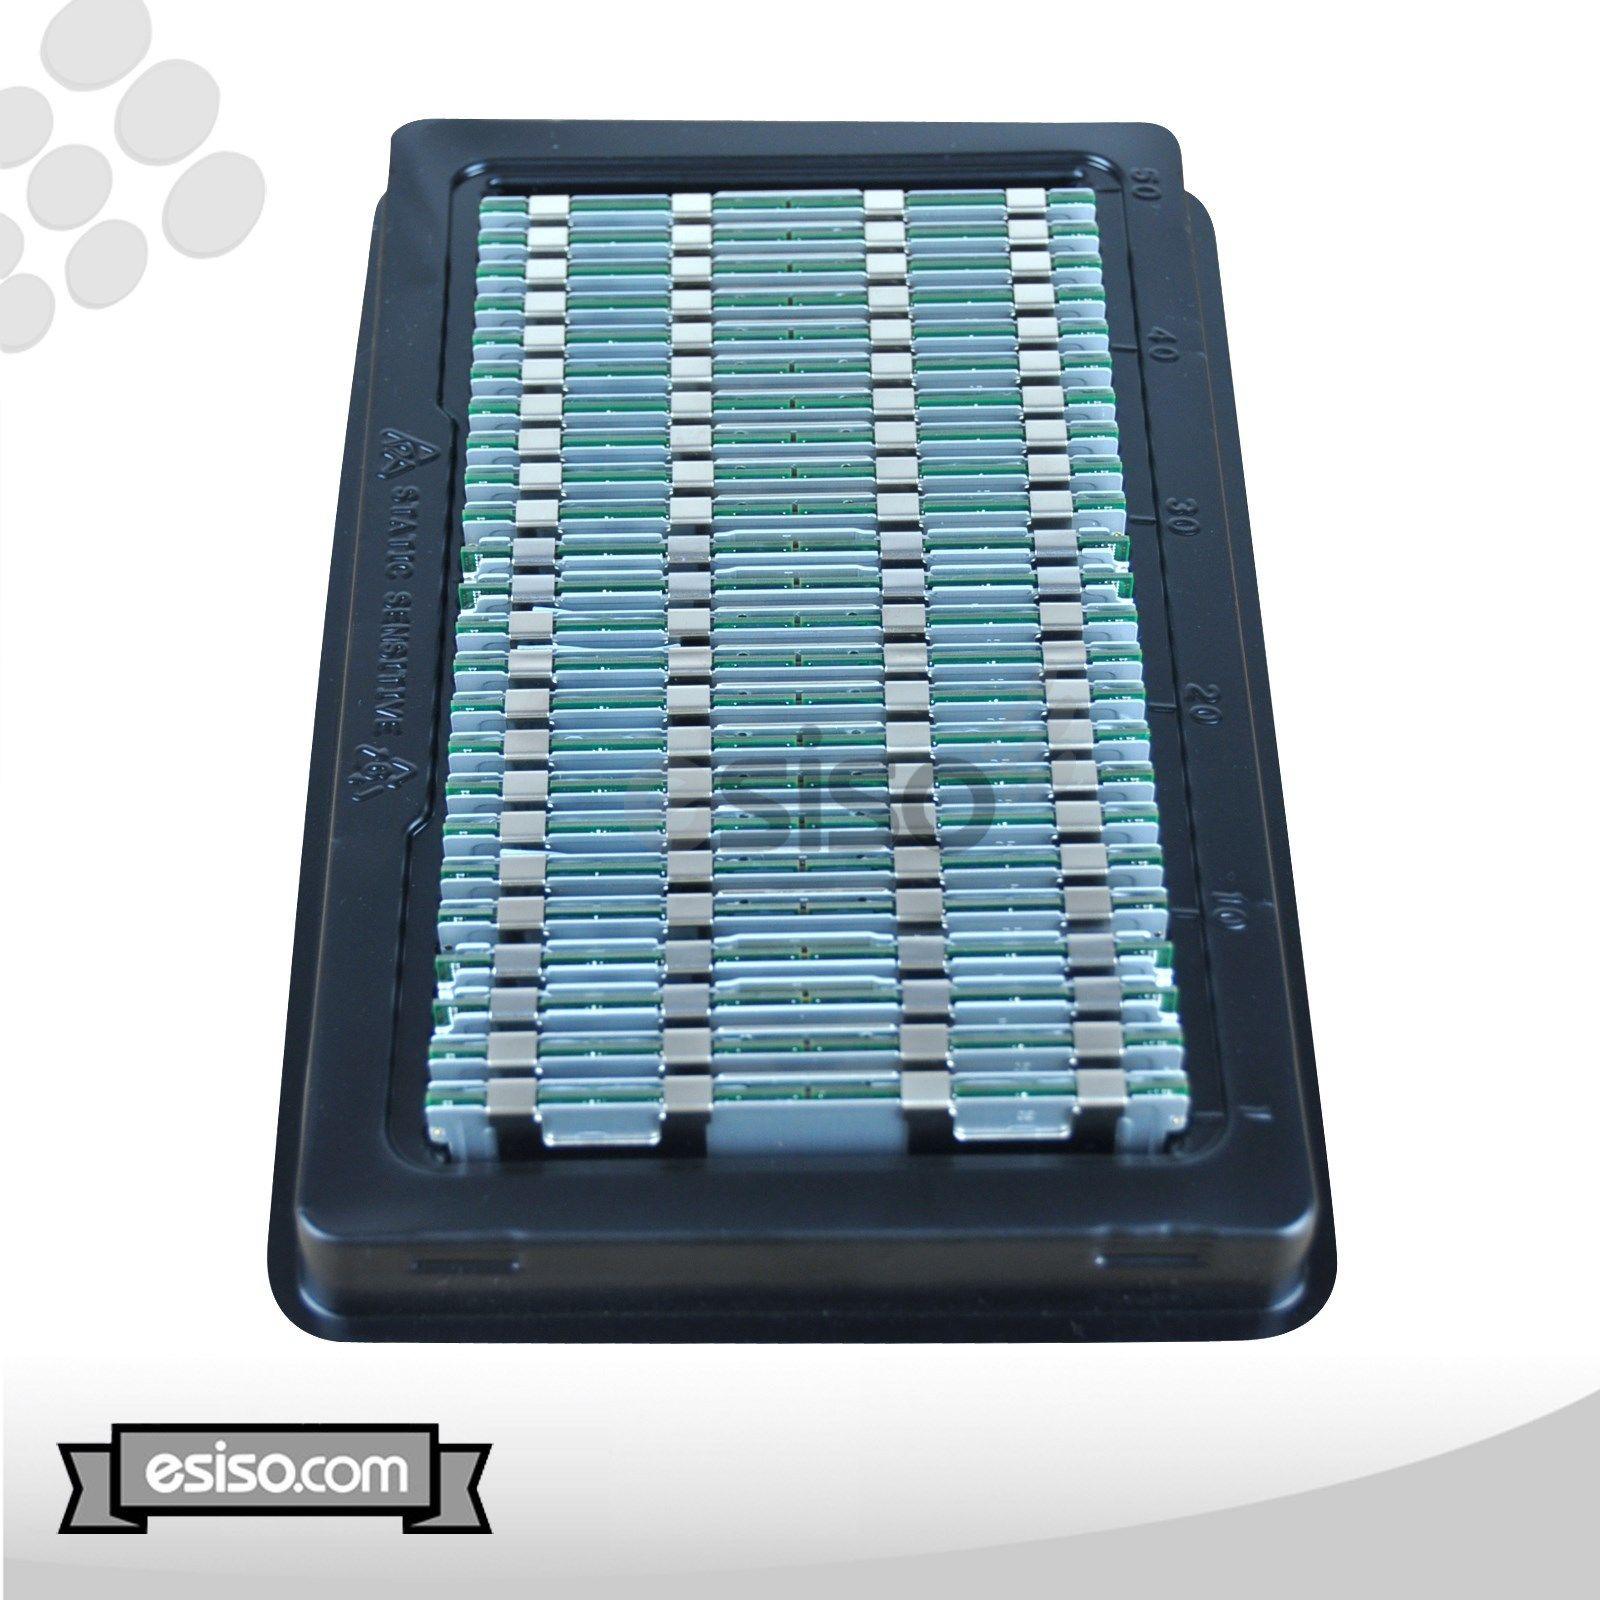 Sekaimonhp Hp Omnibook Xe2 Service Manual 48gb 12x4gb Pc3 10600r For Proliant Dl370 G6 Dl380 G7 Reg Ddr3 Memory G7ddr348gb12x4gbpc3